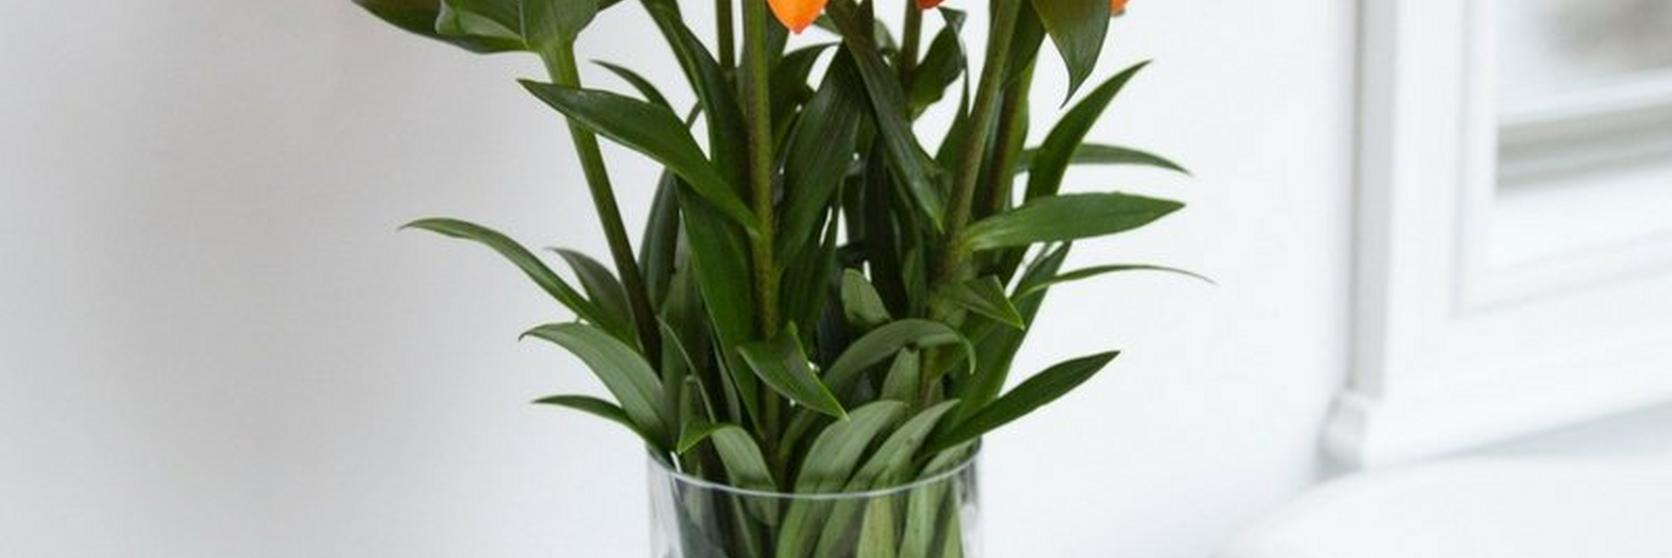 orange-lilies-in-a-vase